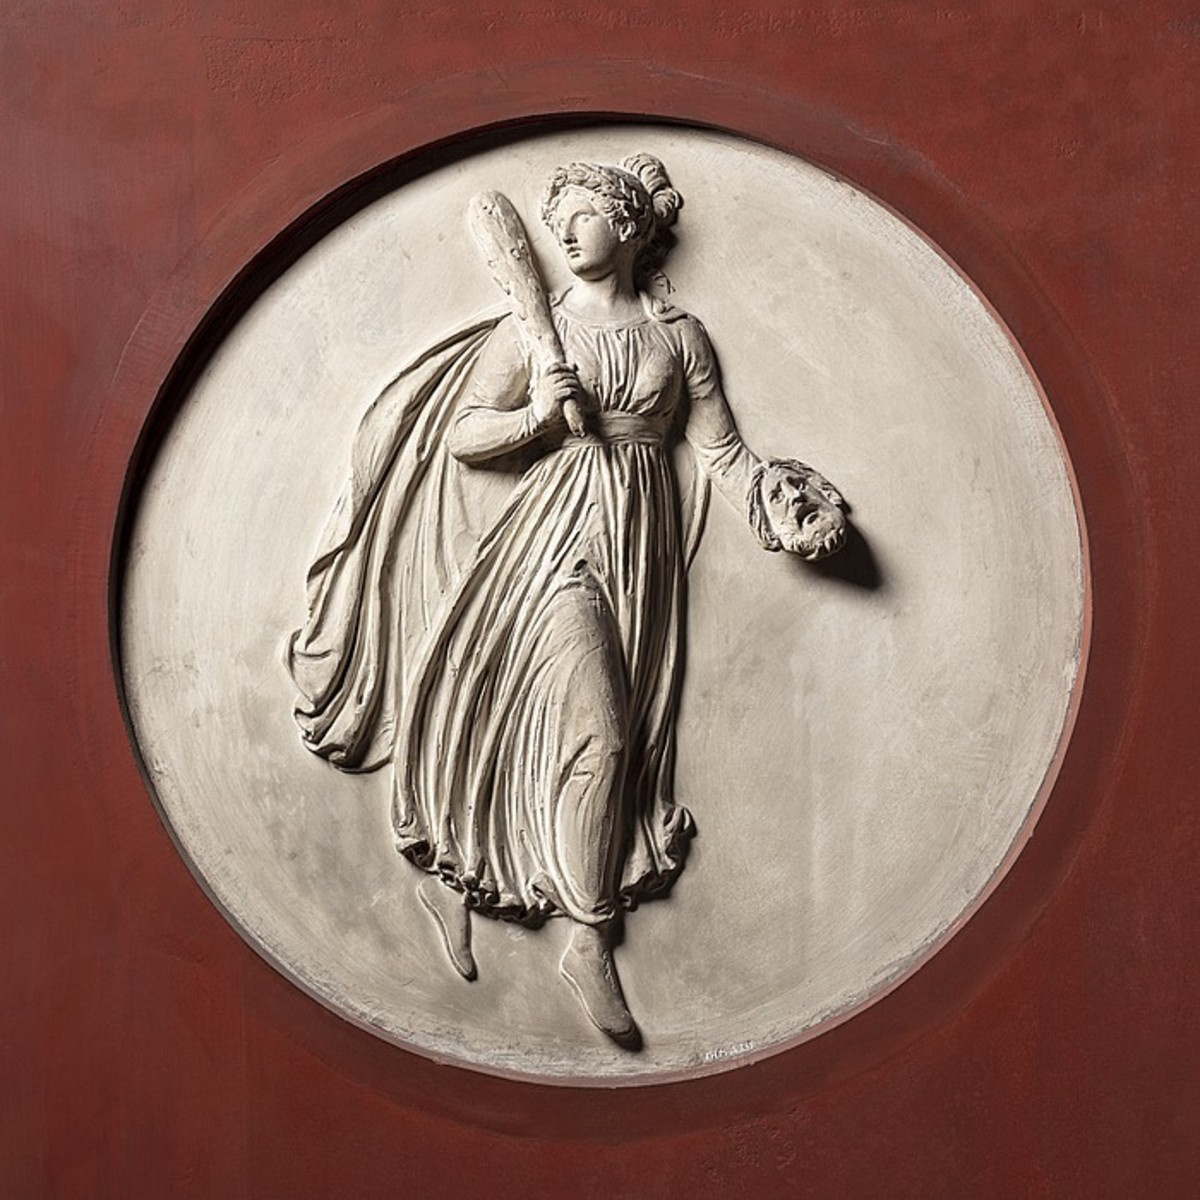 Melpomene, Muse of Tragedy